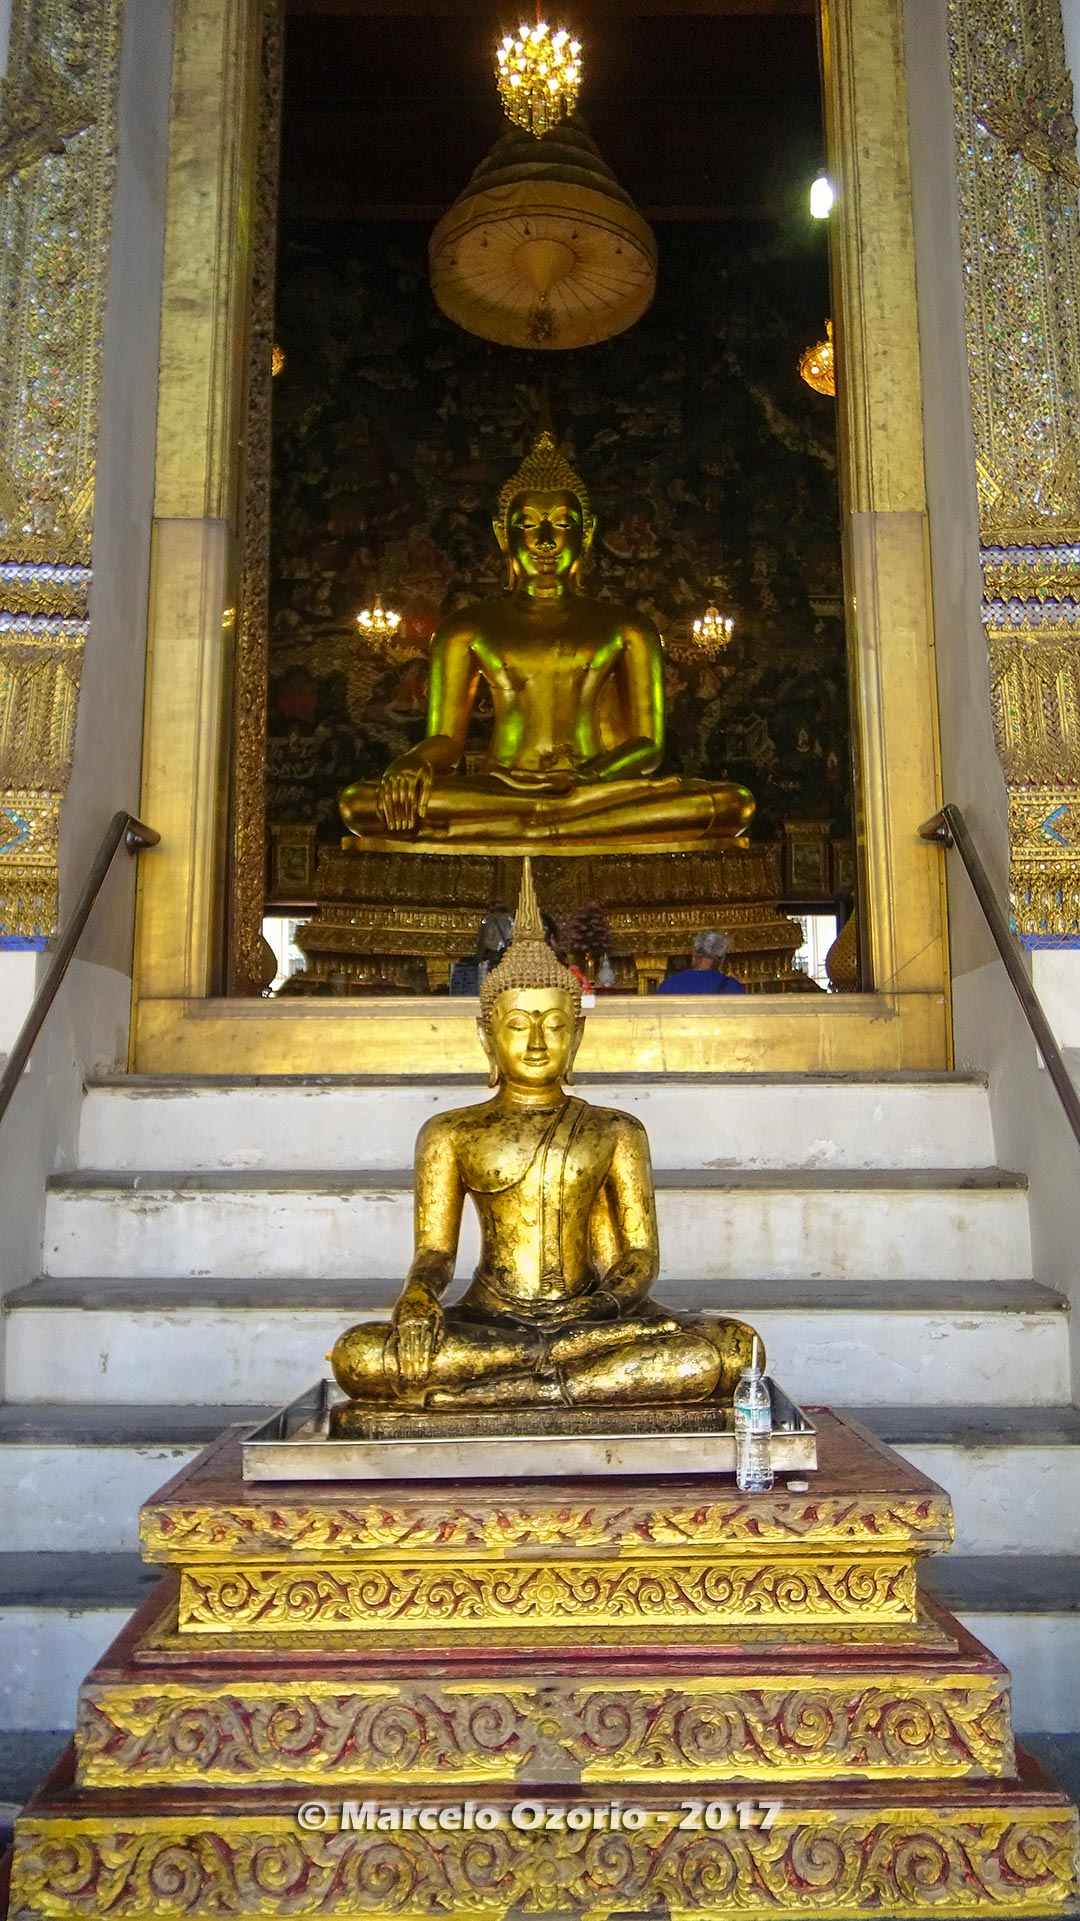 budhas bangkok thailand serie 13 - Buddhas of Bangkok - Thailand